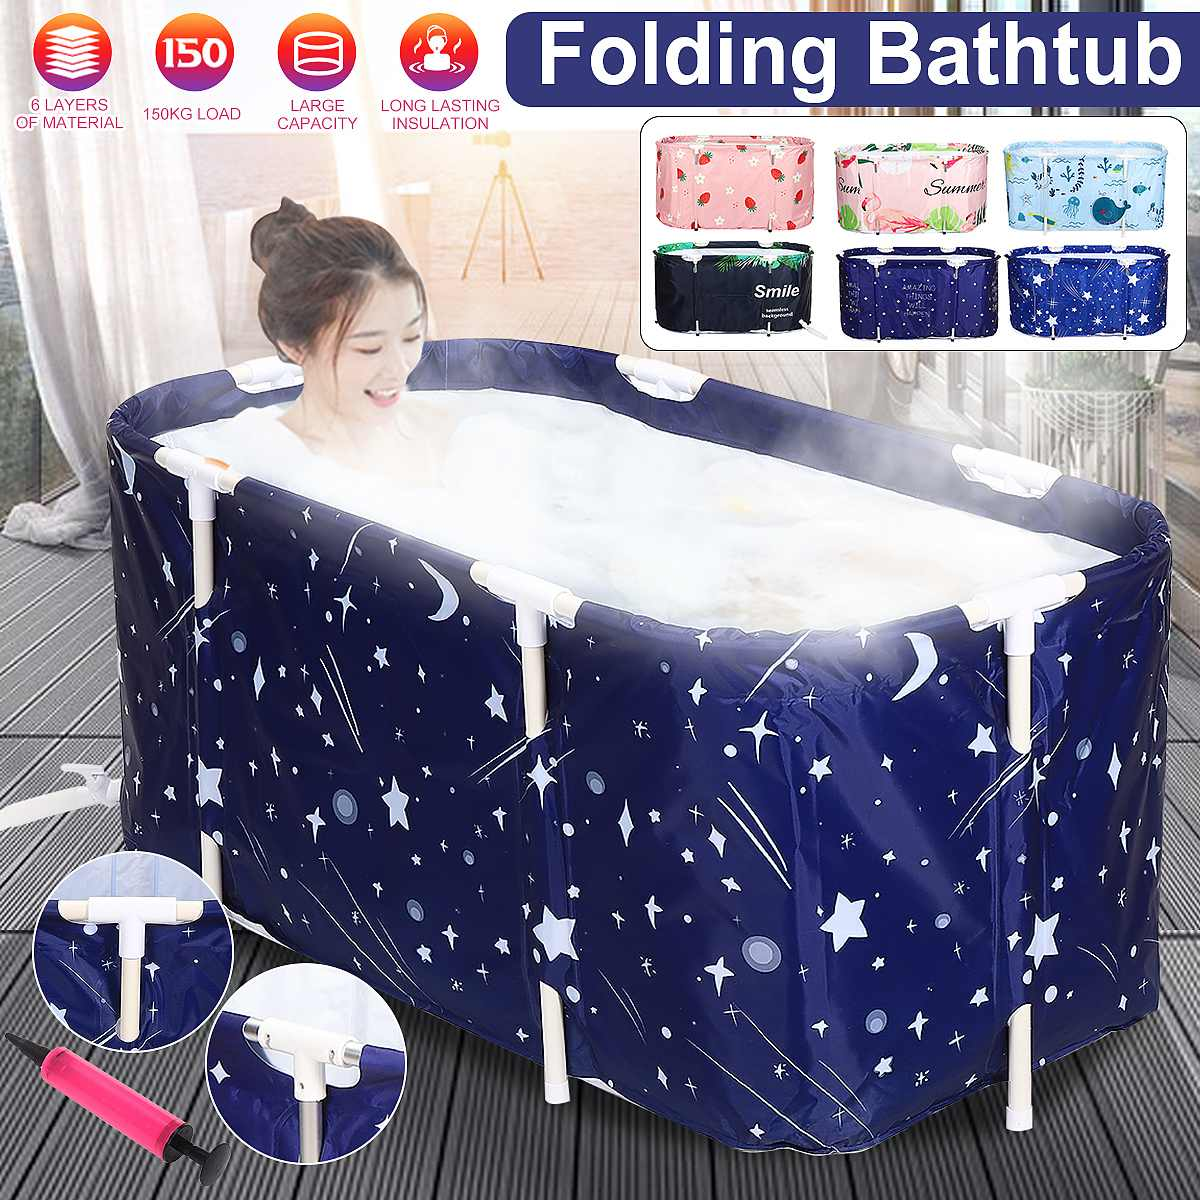 Portable Folding Bathtub Set Tub Bucket Kit Soaking Bathing Tub For Adult Kids Family Beauty Spa Bathtub